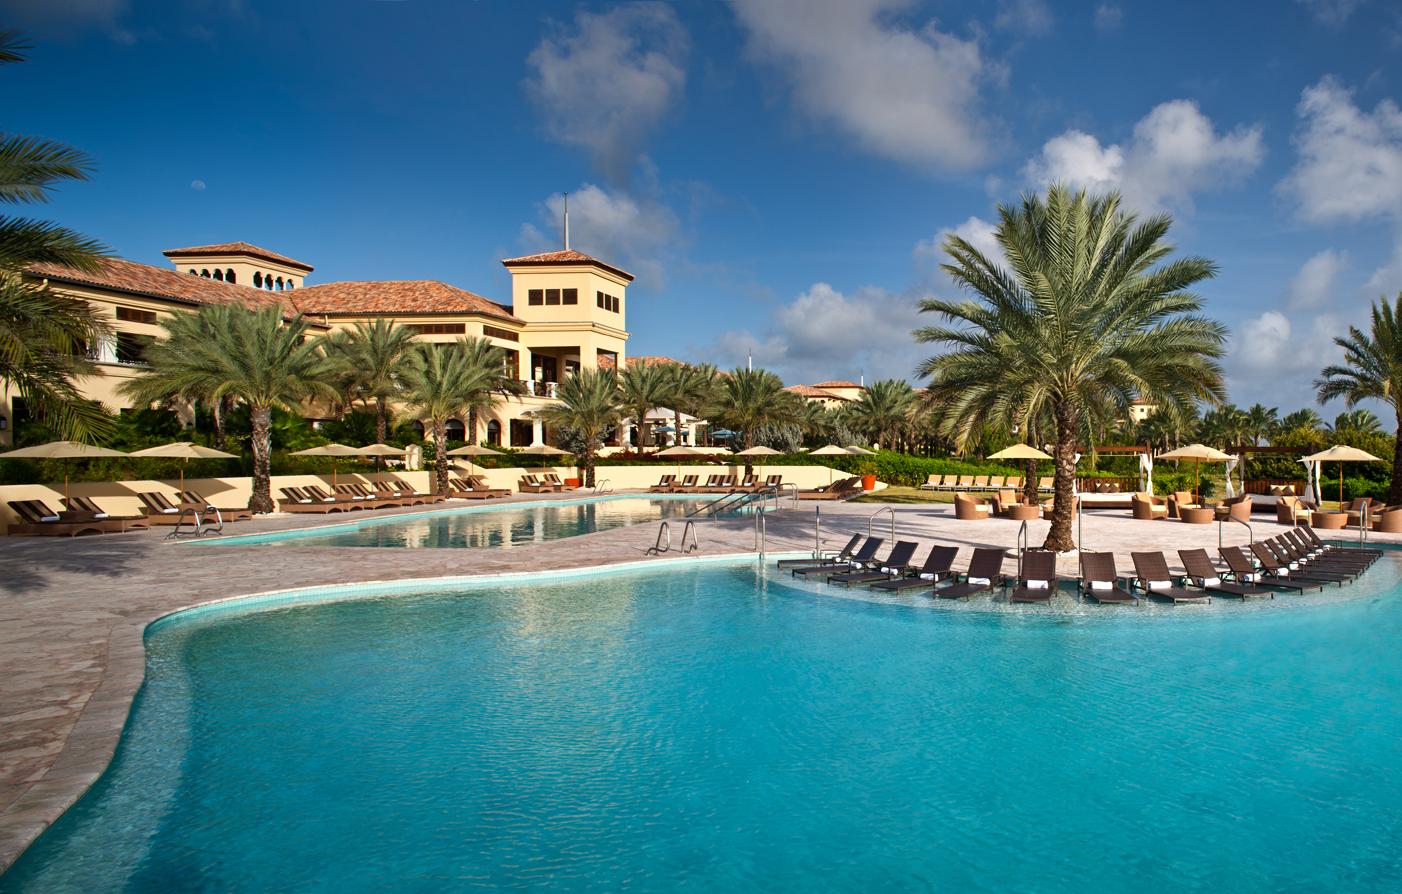 Luxury Hotels On The Beach In Santa Barbara